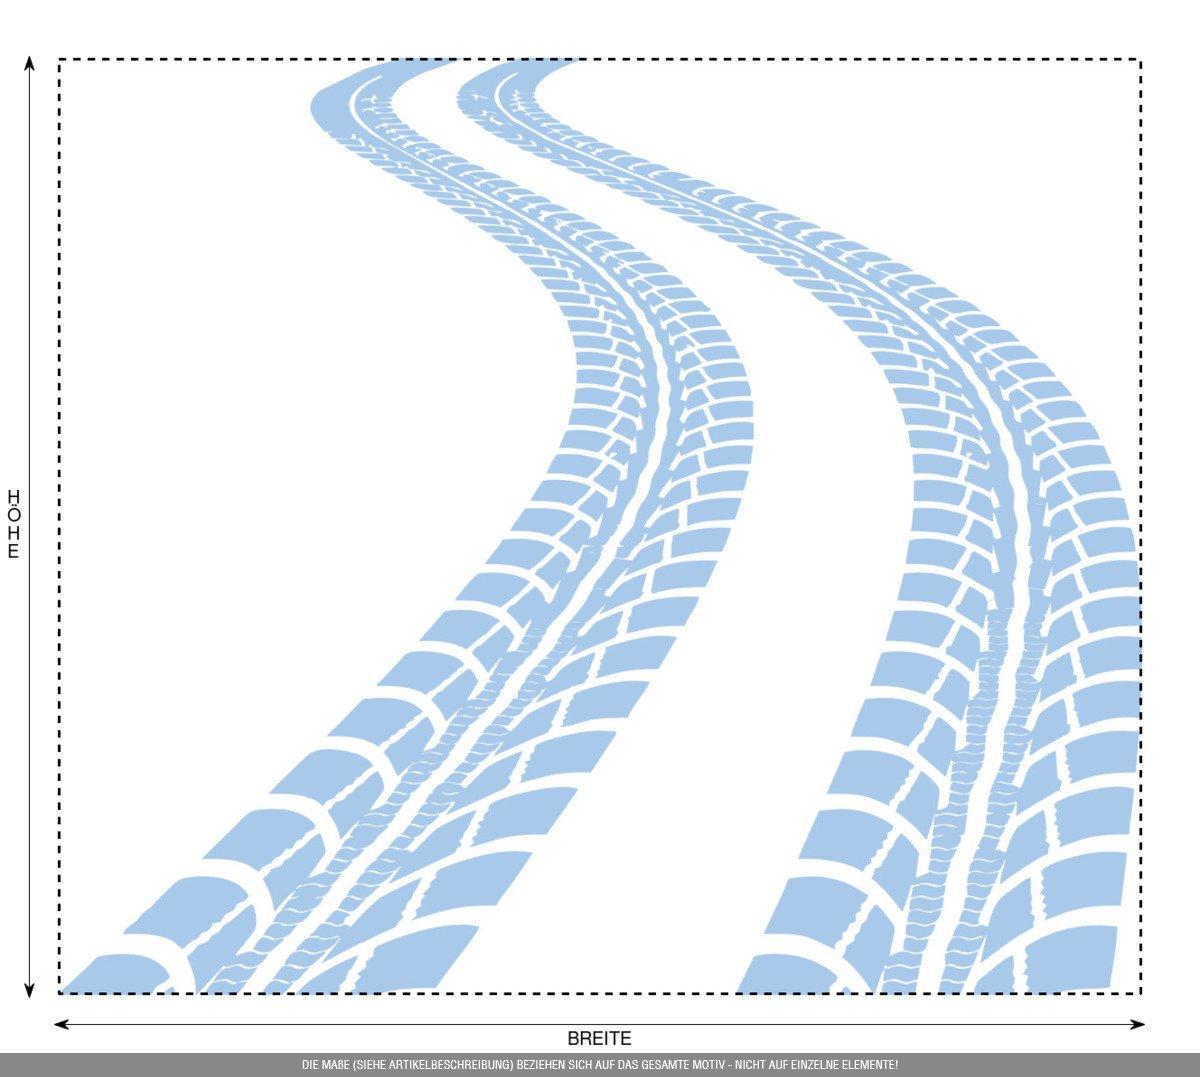 CLICKANDPRINT CLICKANDPRINT CLICKANDPRINT Aufkleber » Reifen-Spuren, 120x103,7cm, Schwarz • Wandtattoo   Wandaufkleber   Wandsticker   Wanddeko   Vinyl B01NGZTUU9 Wandtattoos & Wandbilder 0b1e40